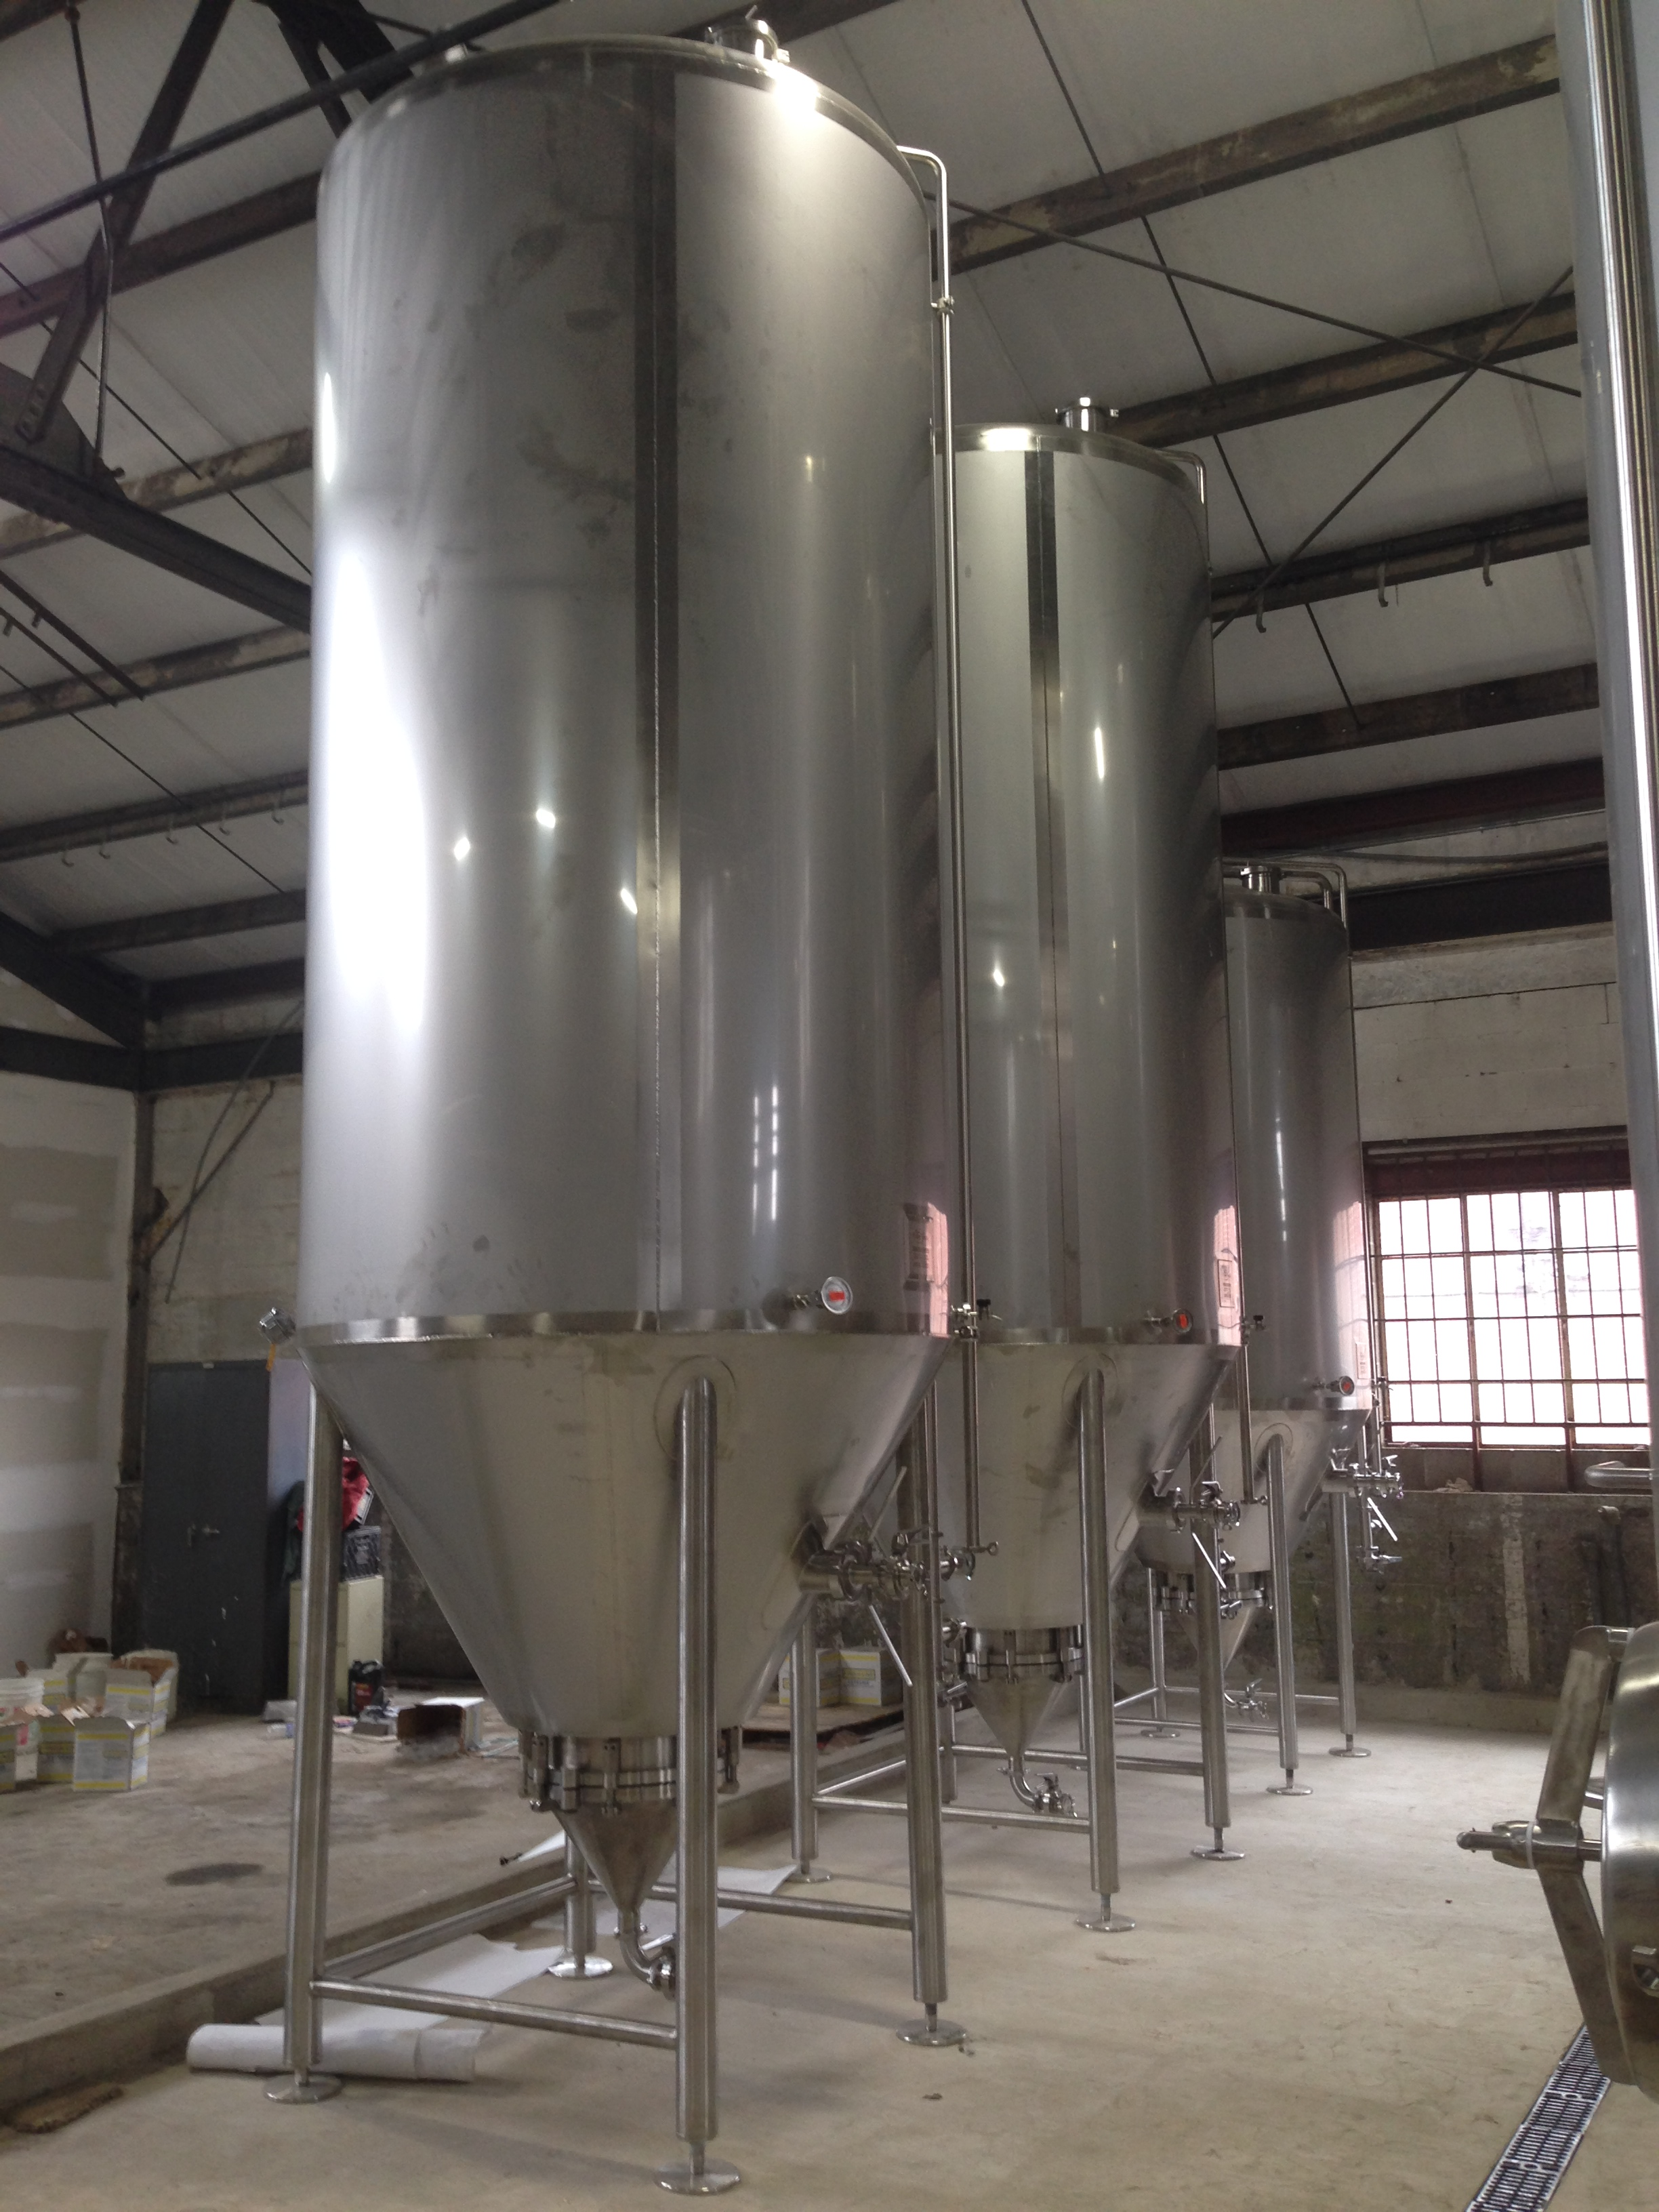 The fermentors. Beer Beer Beer!